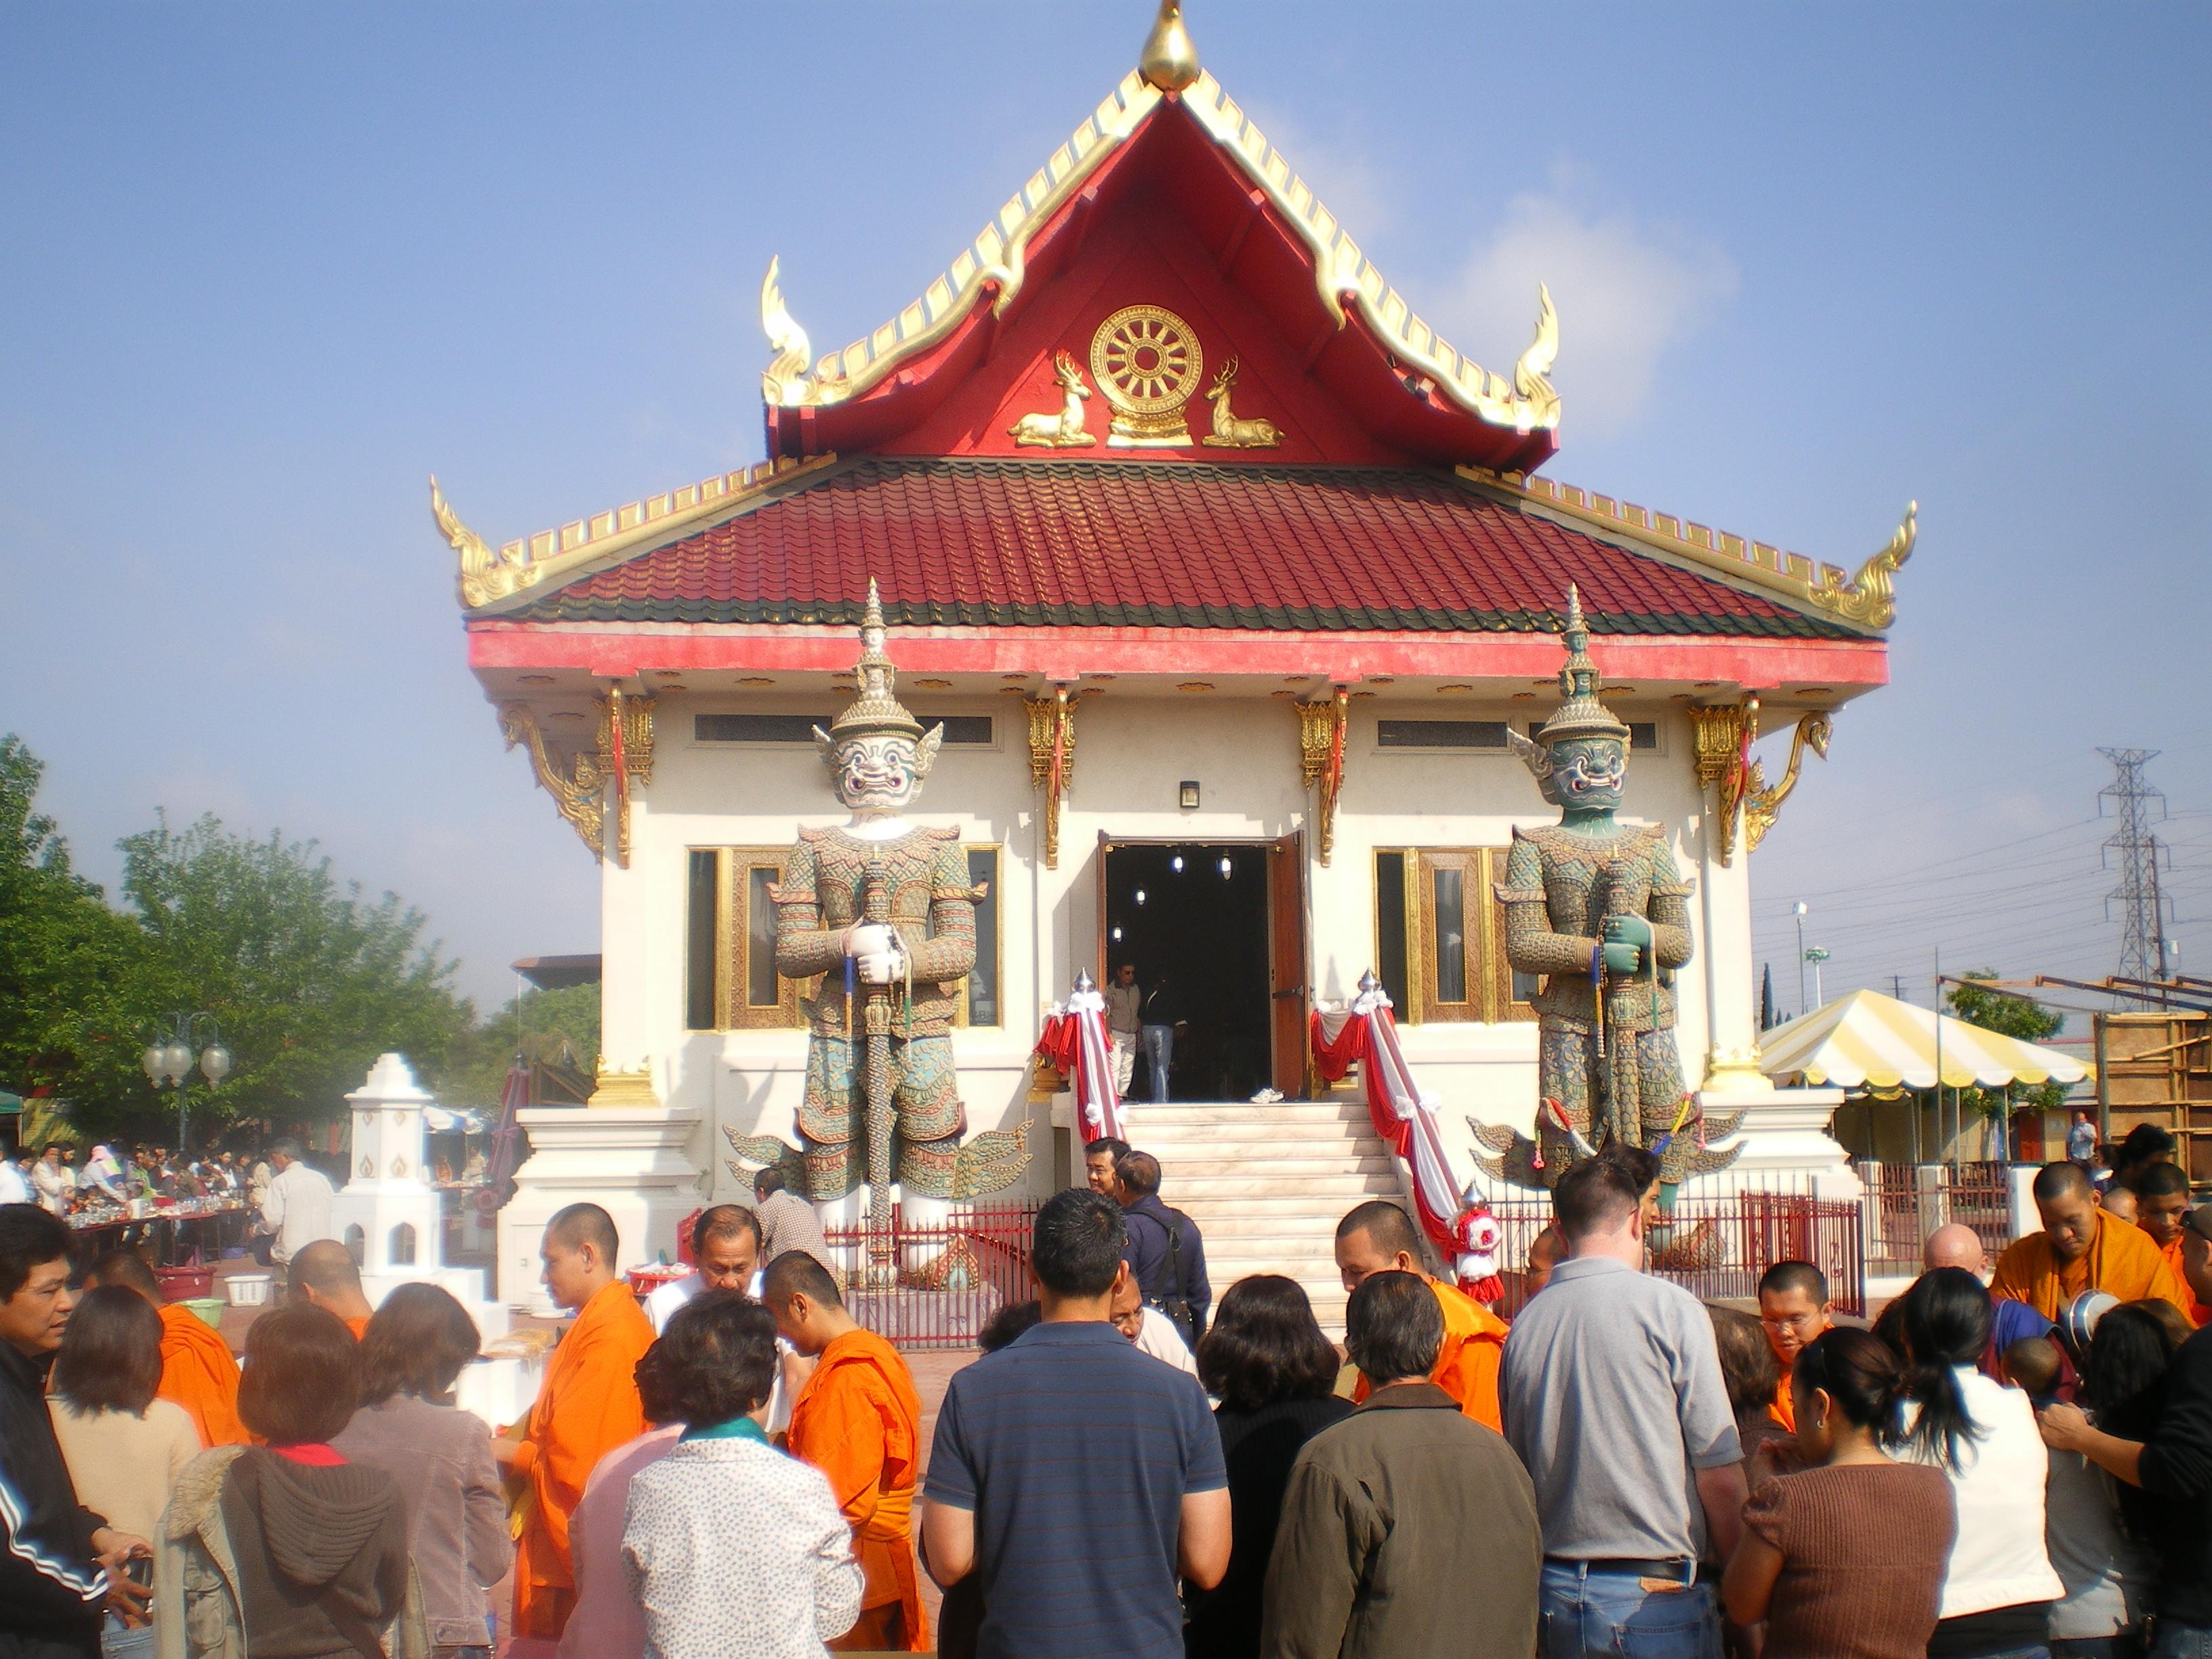 Songkran_at_Wat_Thai_in_Los_Angeles,_April_2008